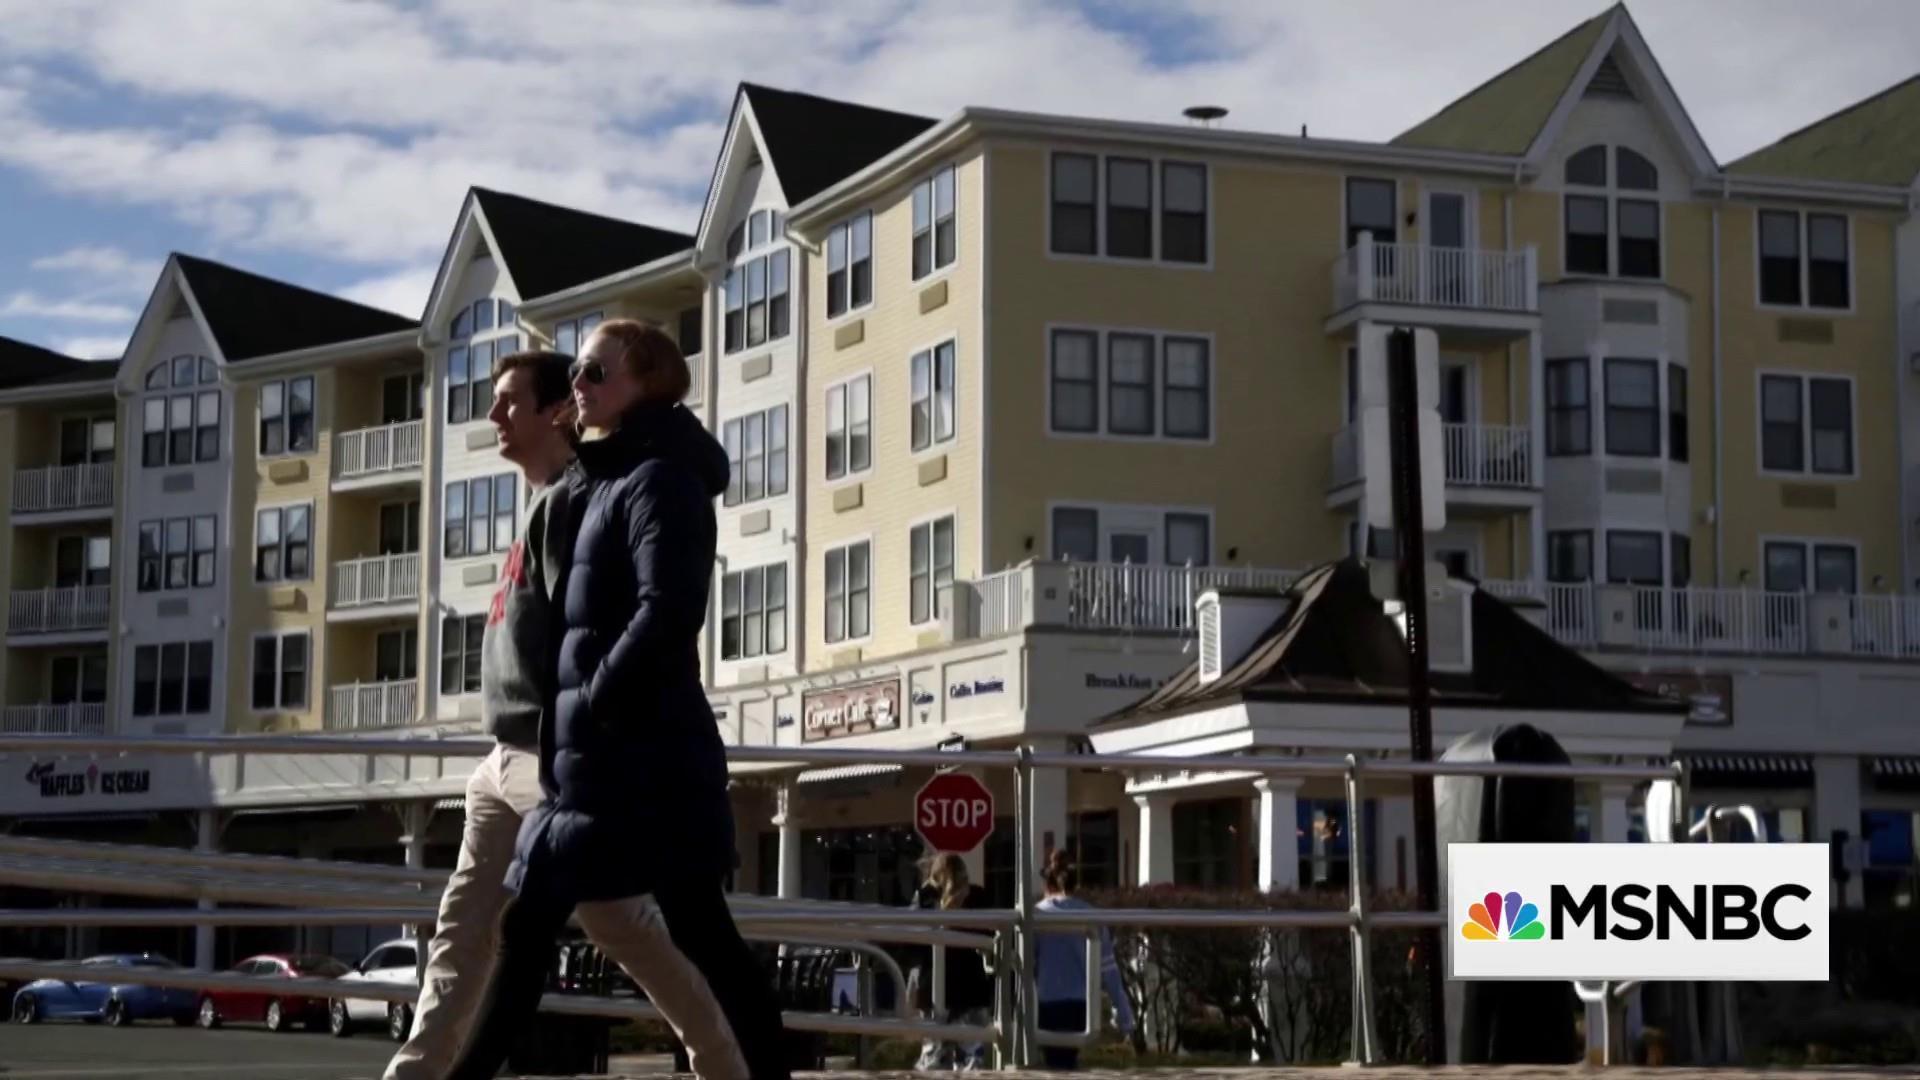 Kushner resort could make millions off gov't-backed ferry project